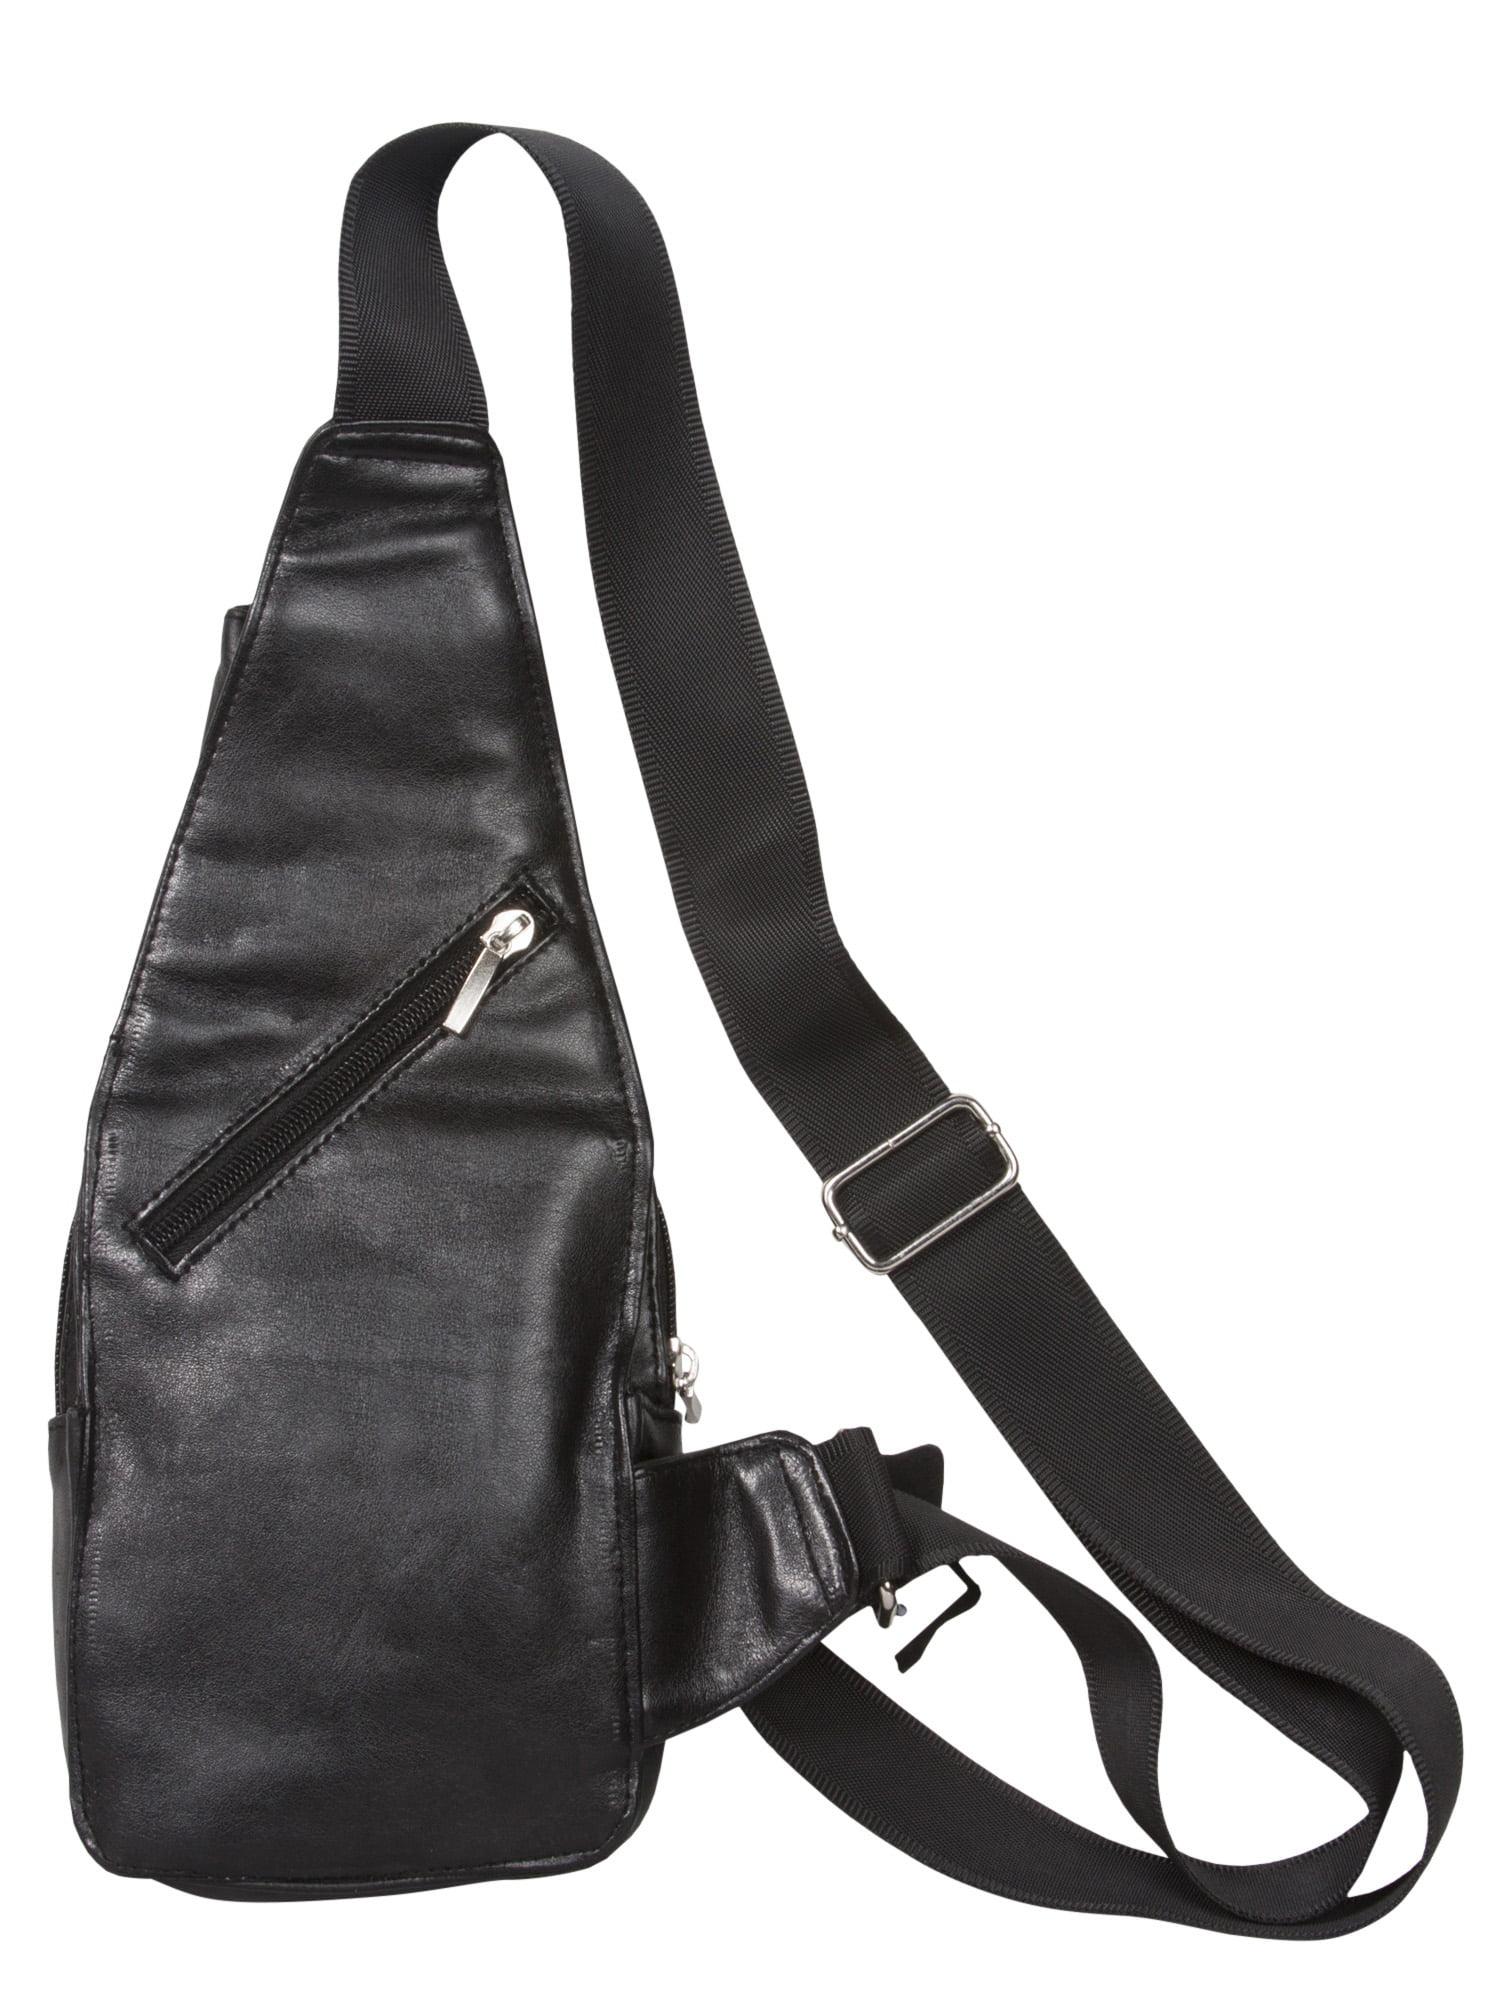 Gravity Travels Leather Hobo Small Sling Backpack Handbag